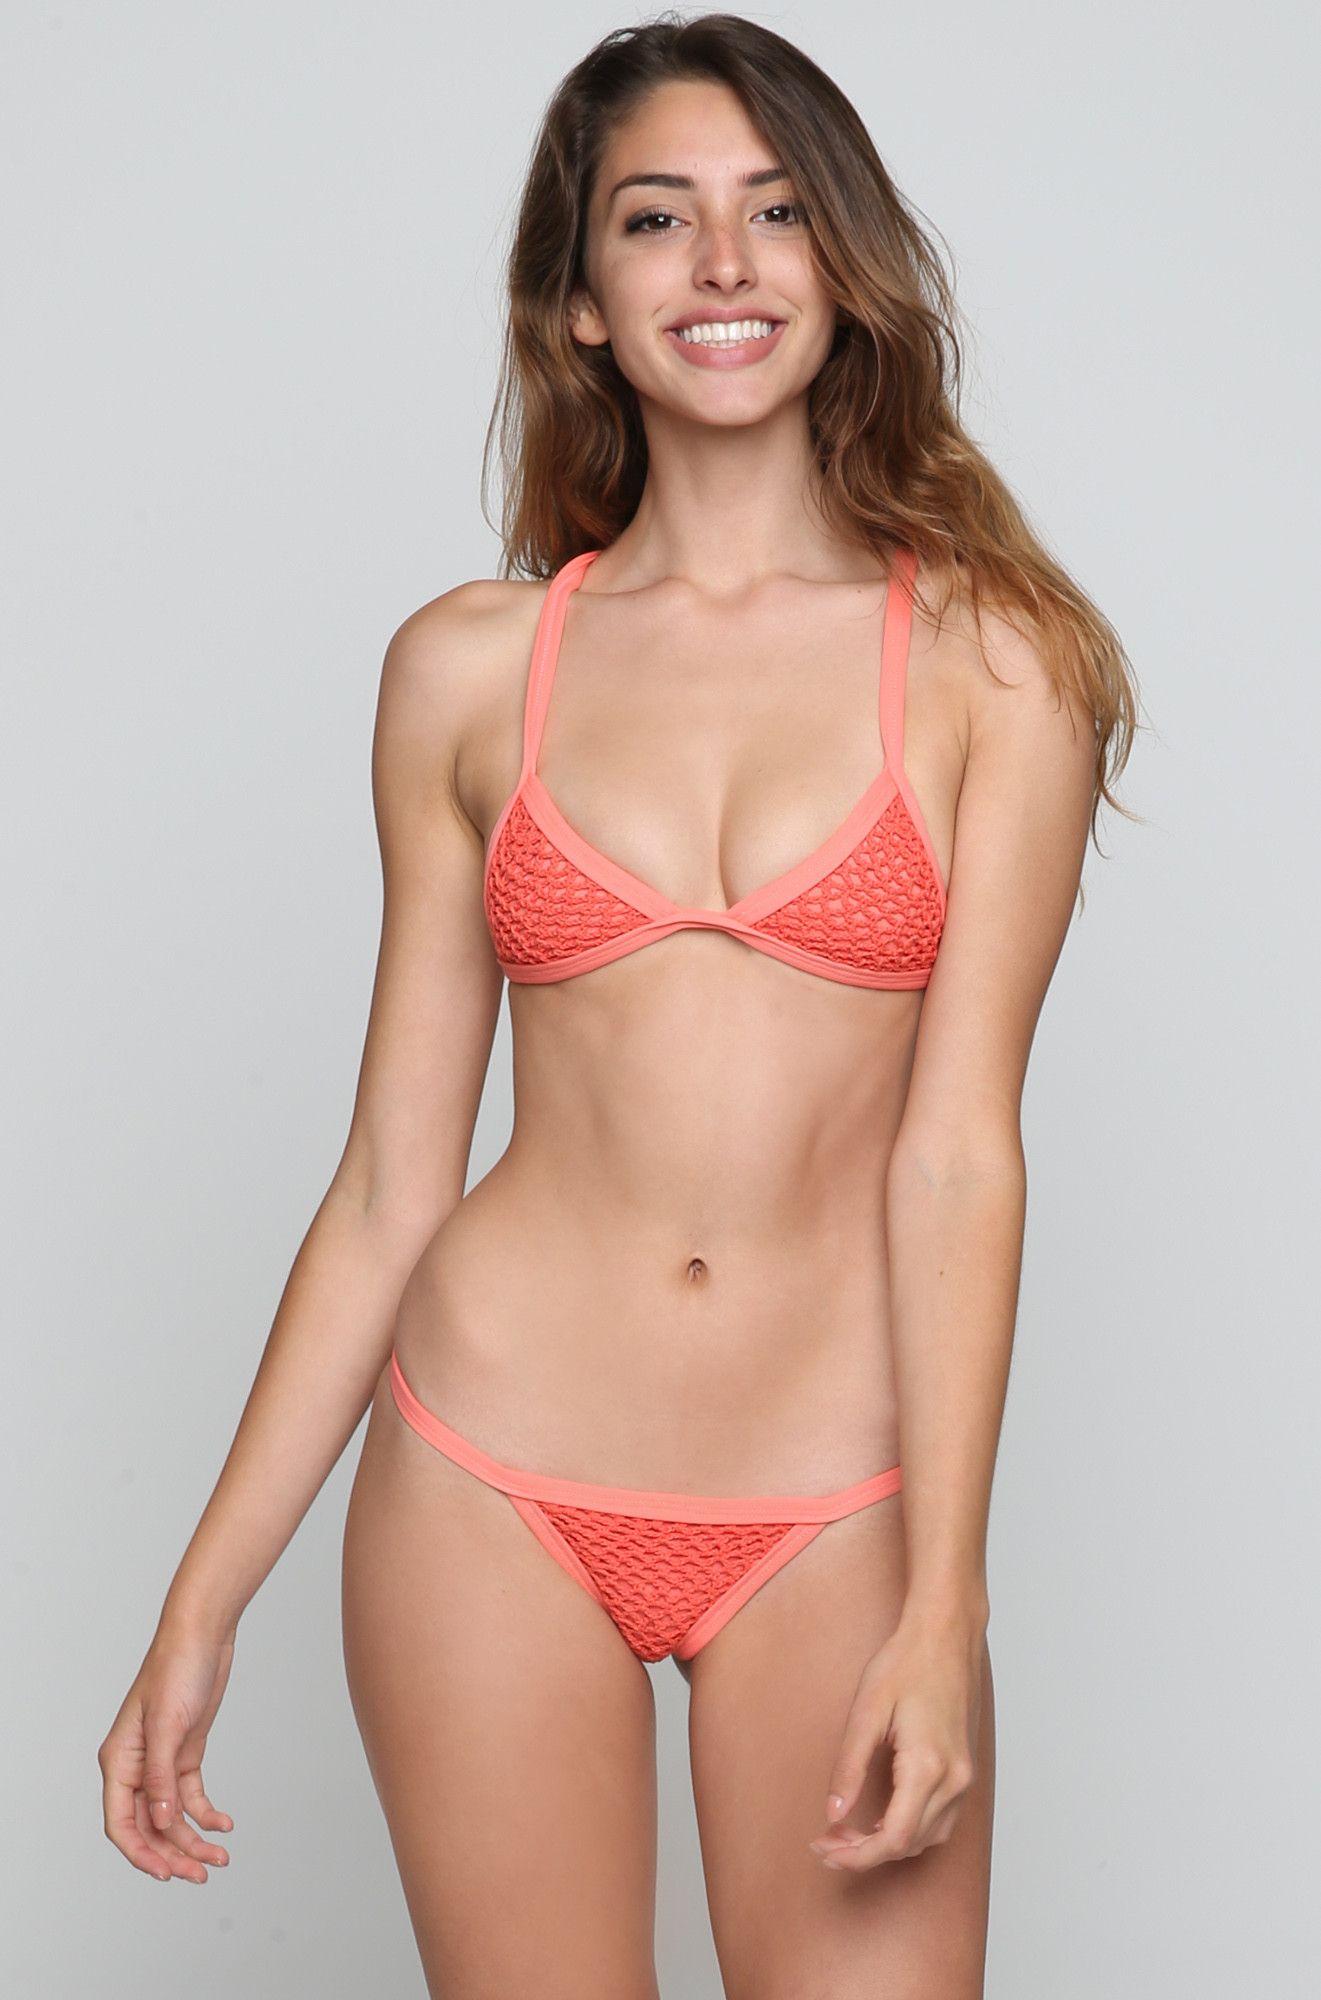 Posh Pua Kainalu Crochet Bikini Top - Papaya >> http://ss1.us/a/C65VmC2s